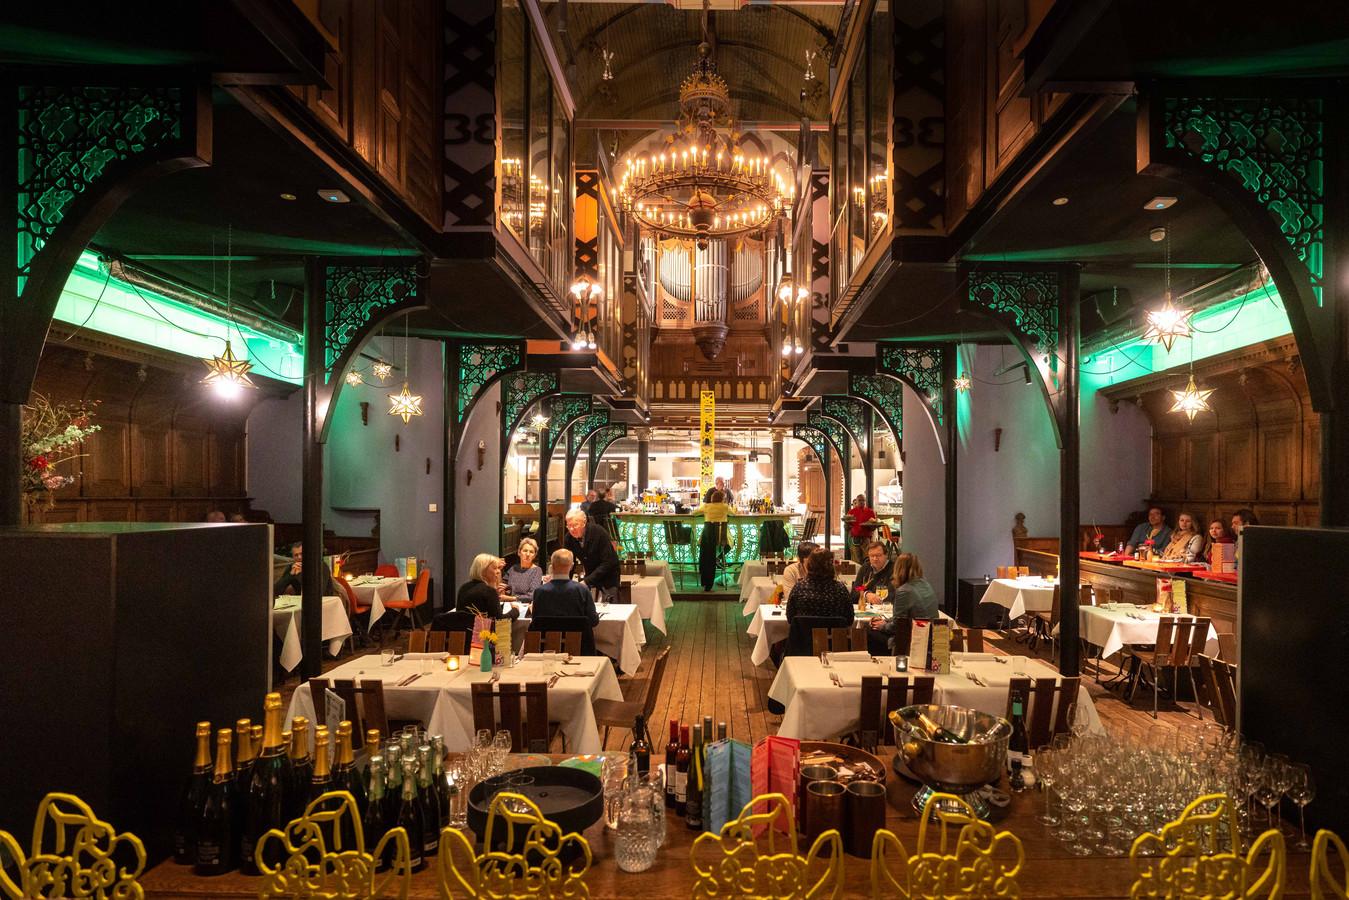 Restaurant Bizar Bzar in Arnhem.